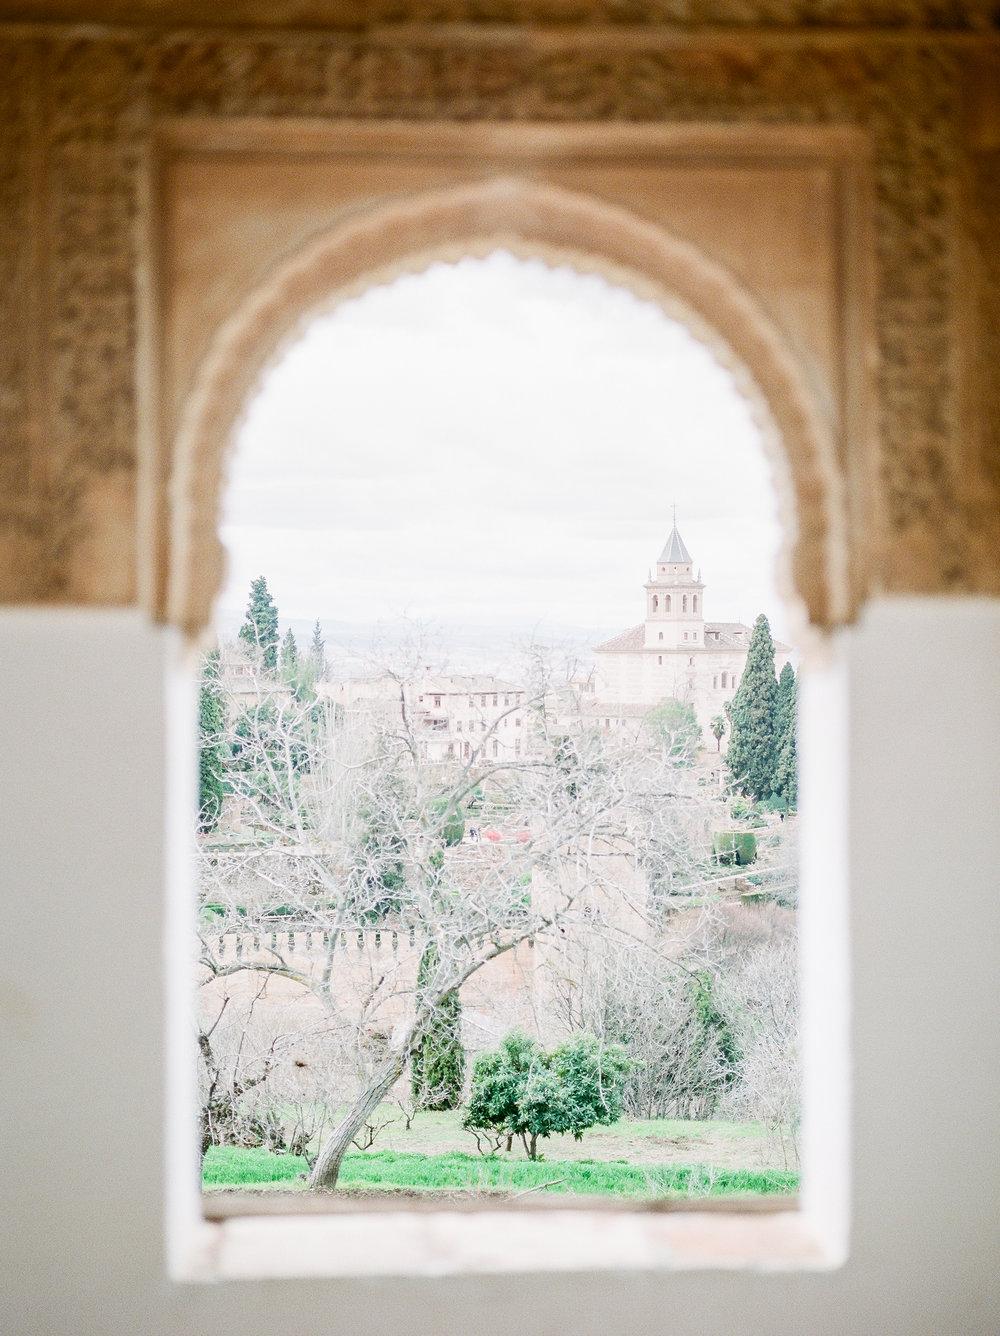 Granada-Alhambra-Traveling-Photographer-182.jpg